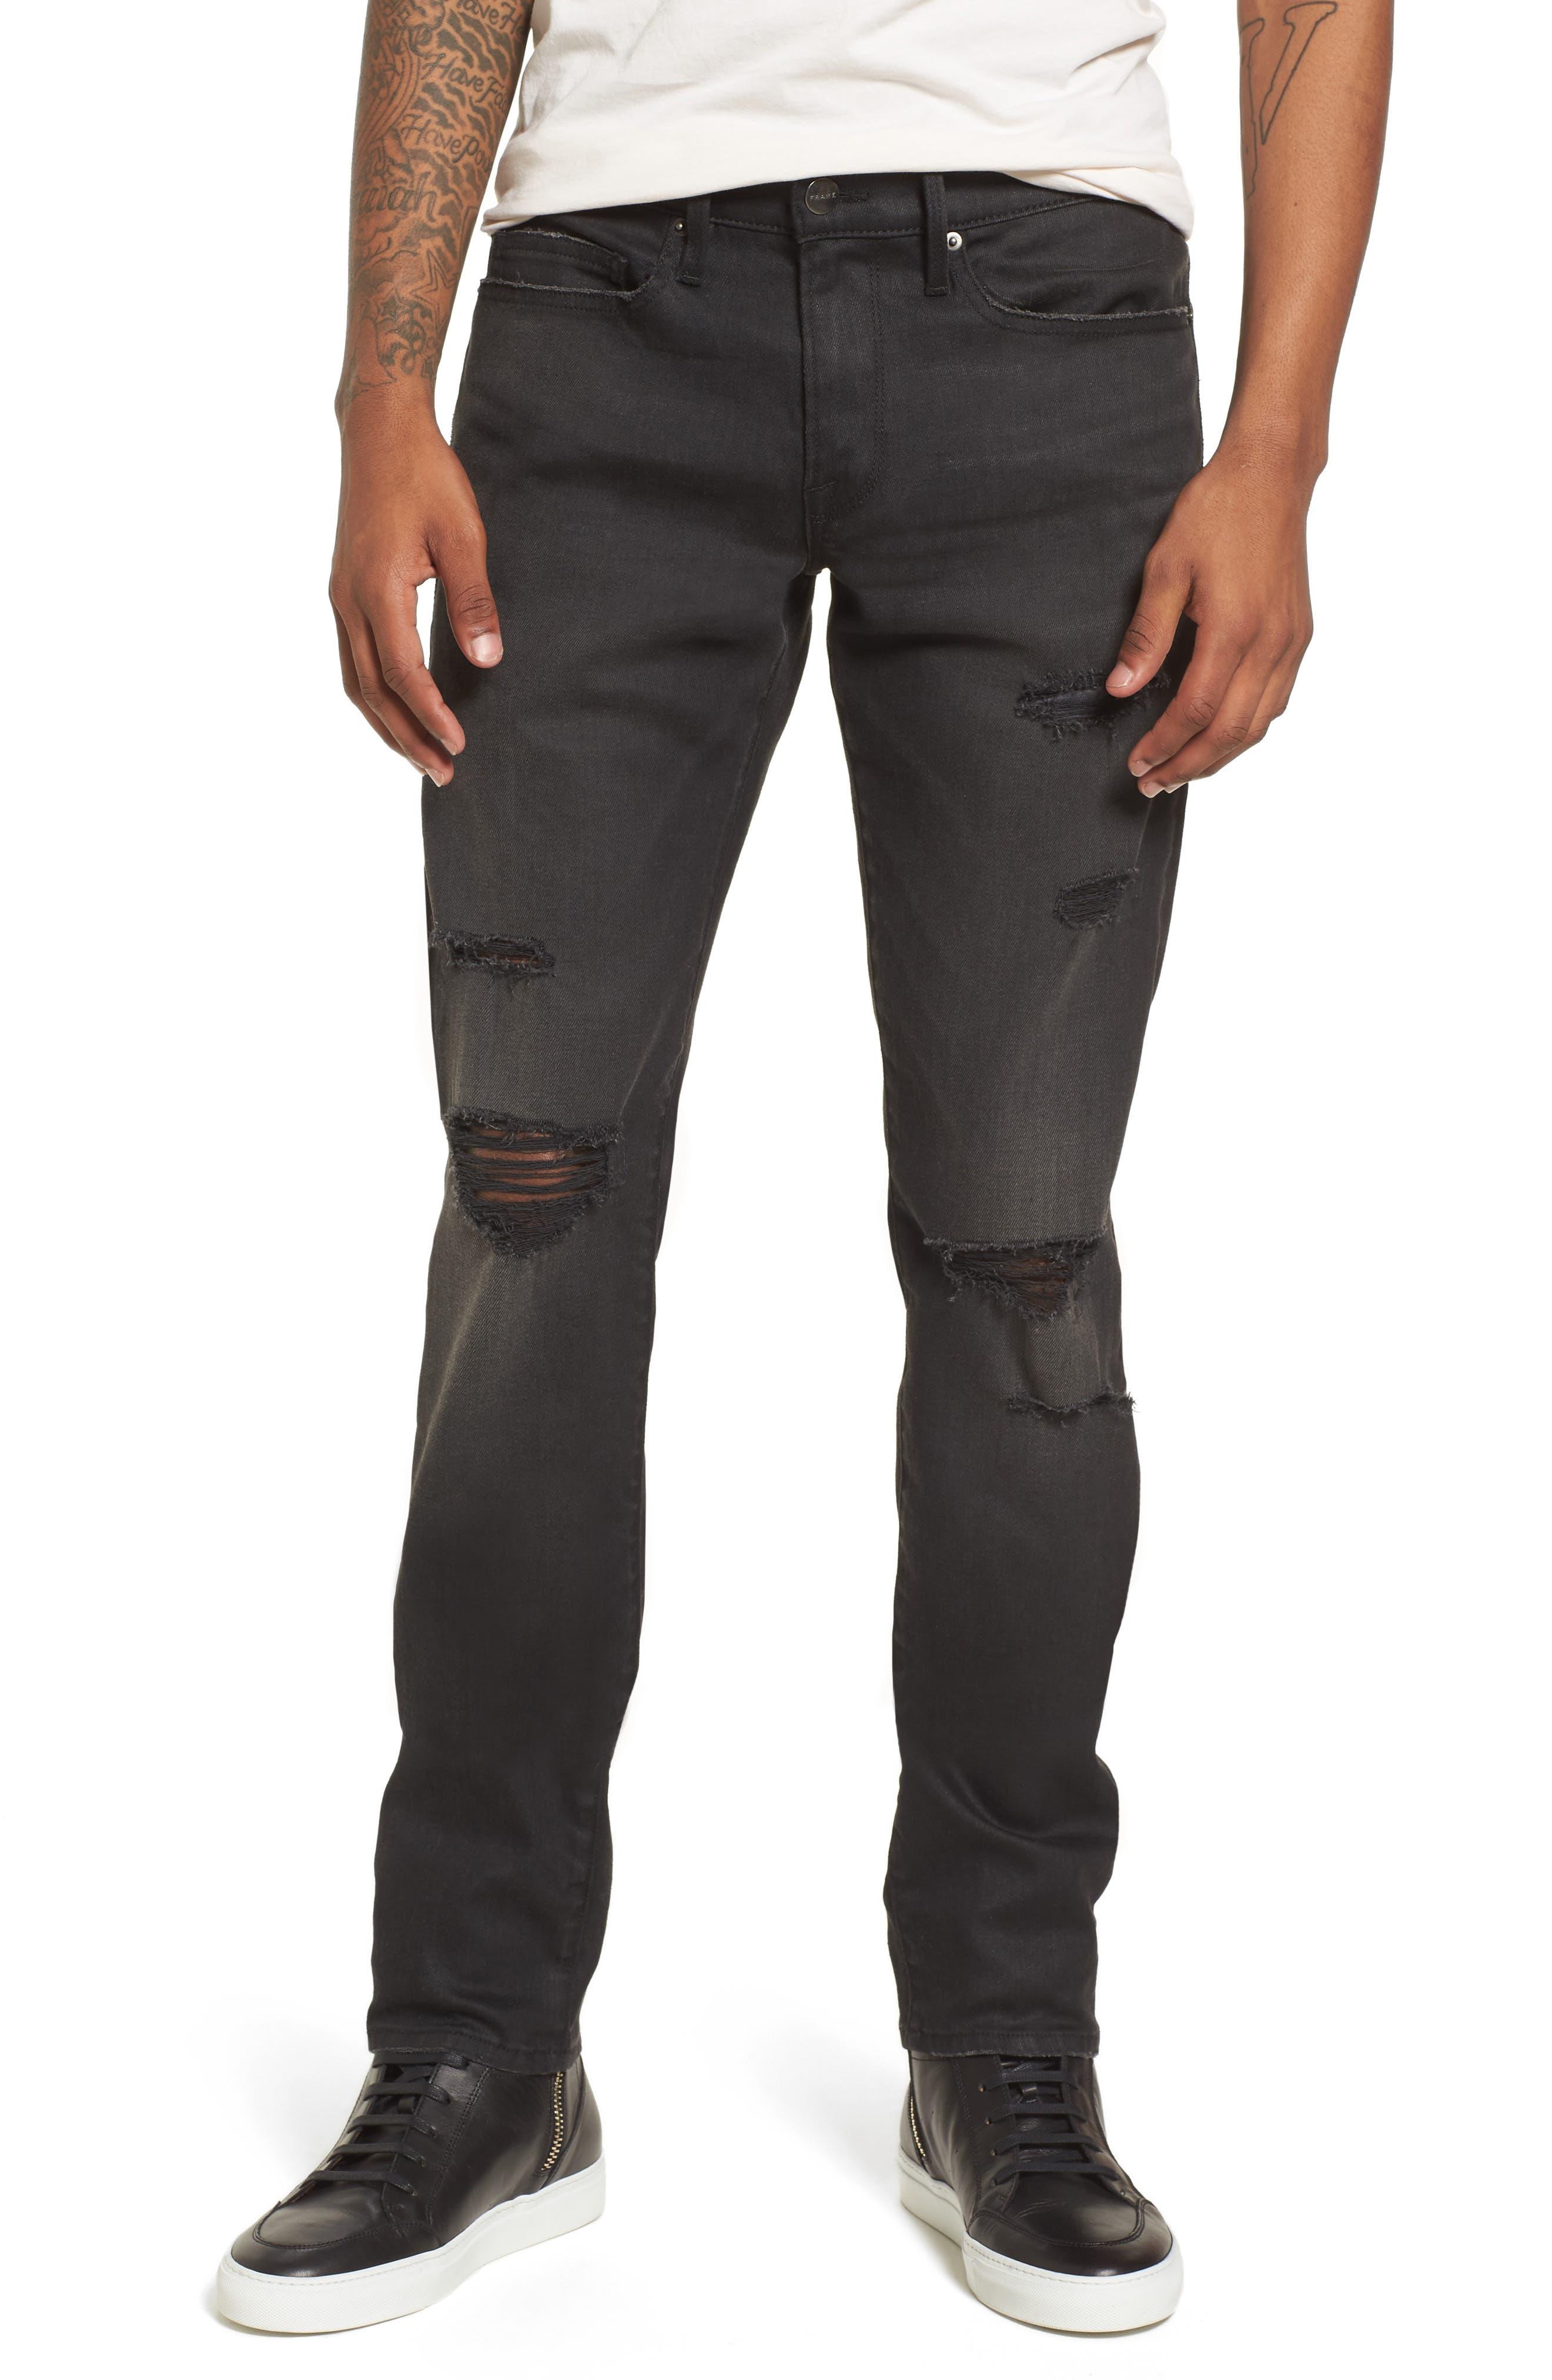 L'Homme Slim Fit Jeans,                         Main,                         color, Flintwood